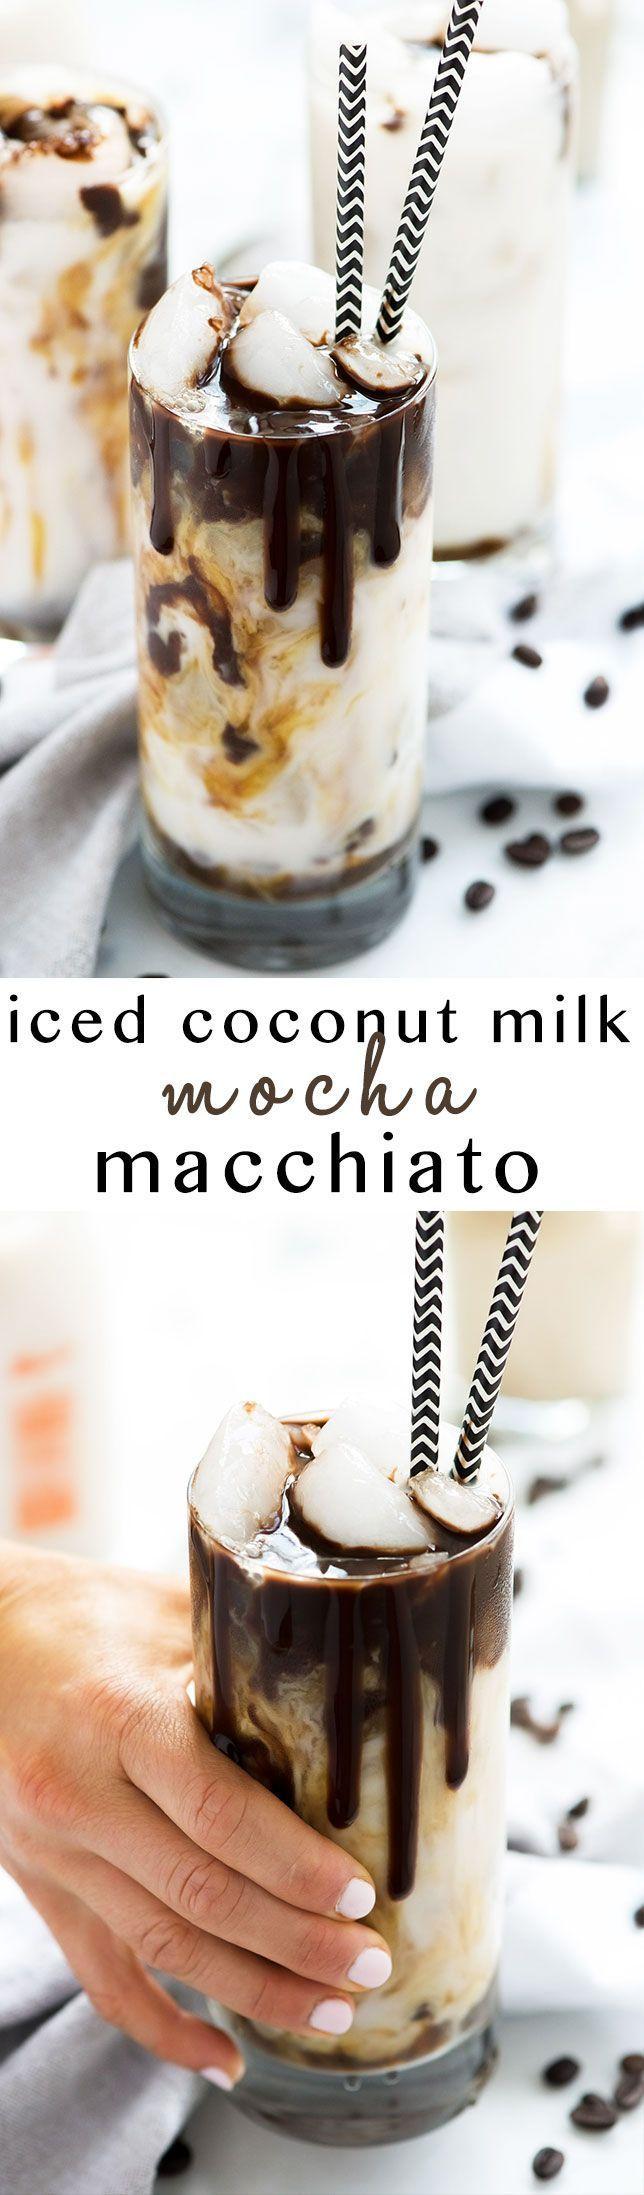 Macchiato Recipe   Cold Brew, Homemade, Starbucks, Iced, Mocha, Latte, Coffee, How to make, Skinny, Coconut Milk